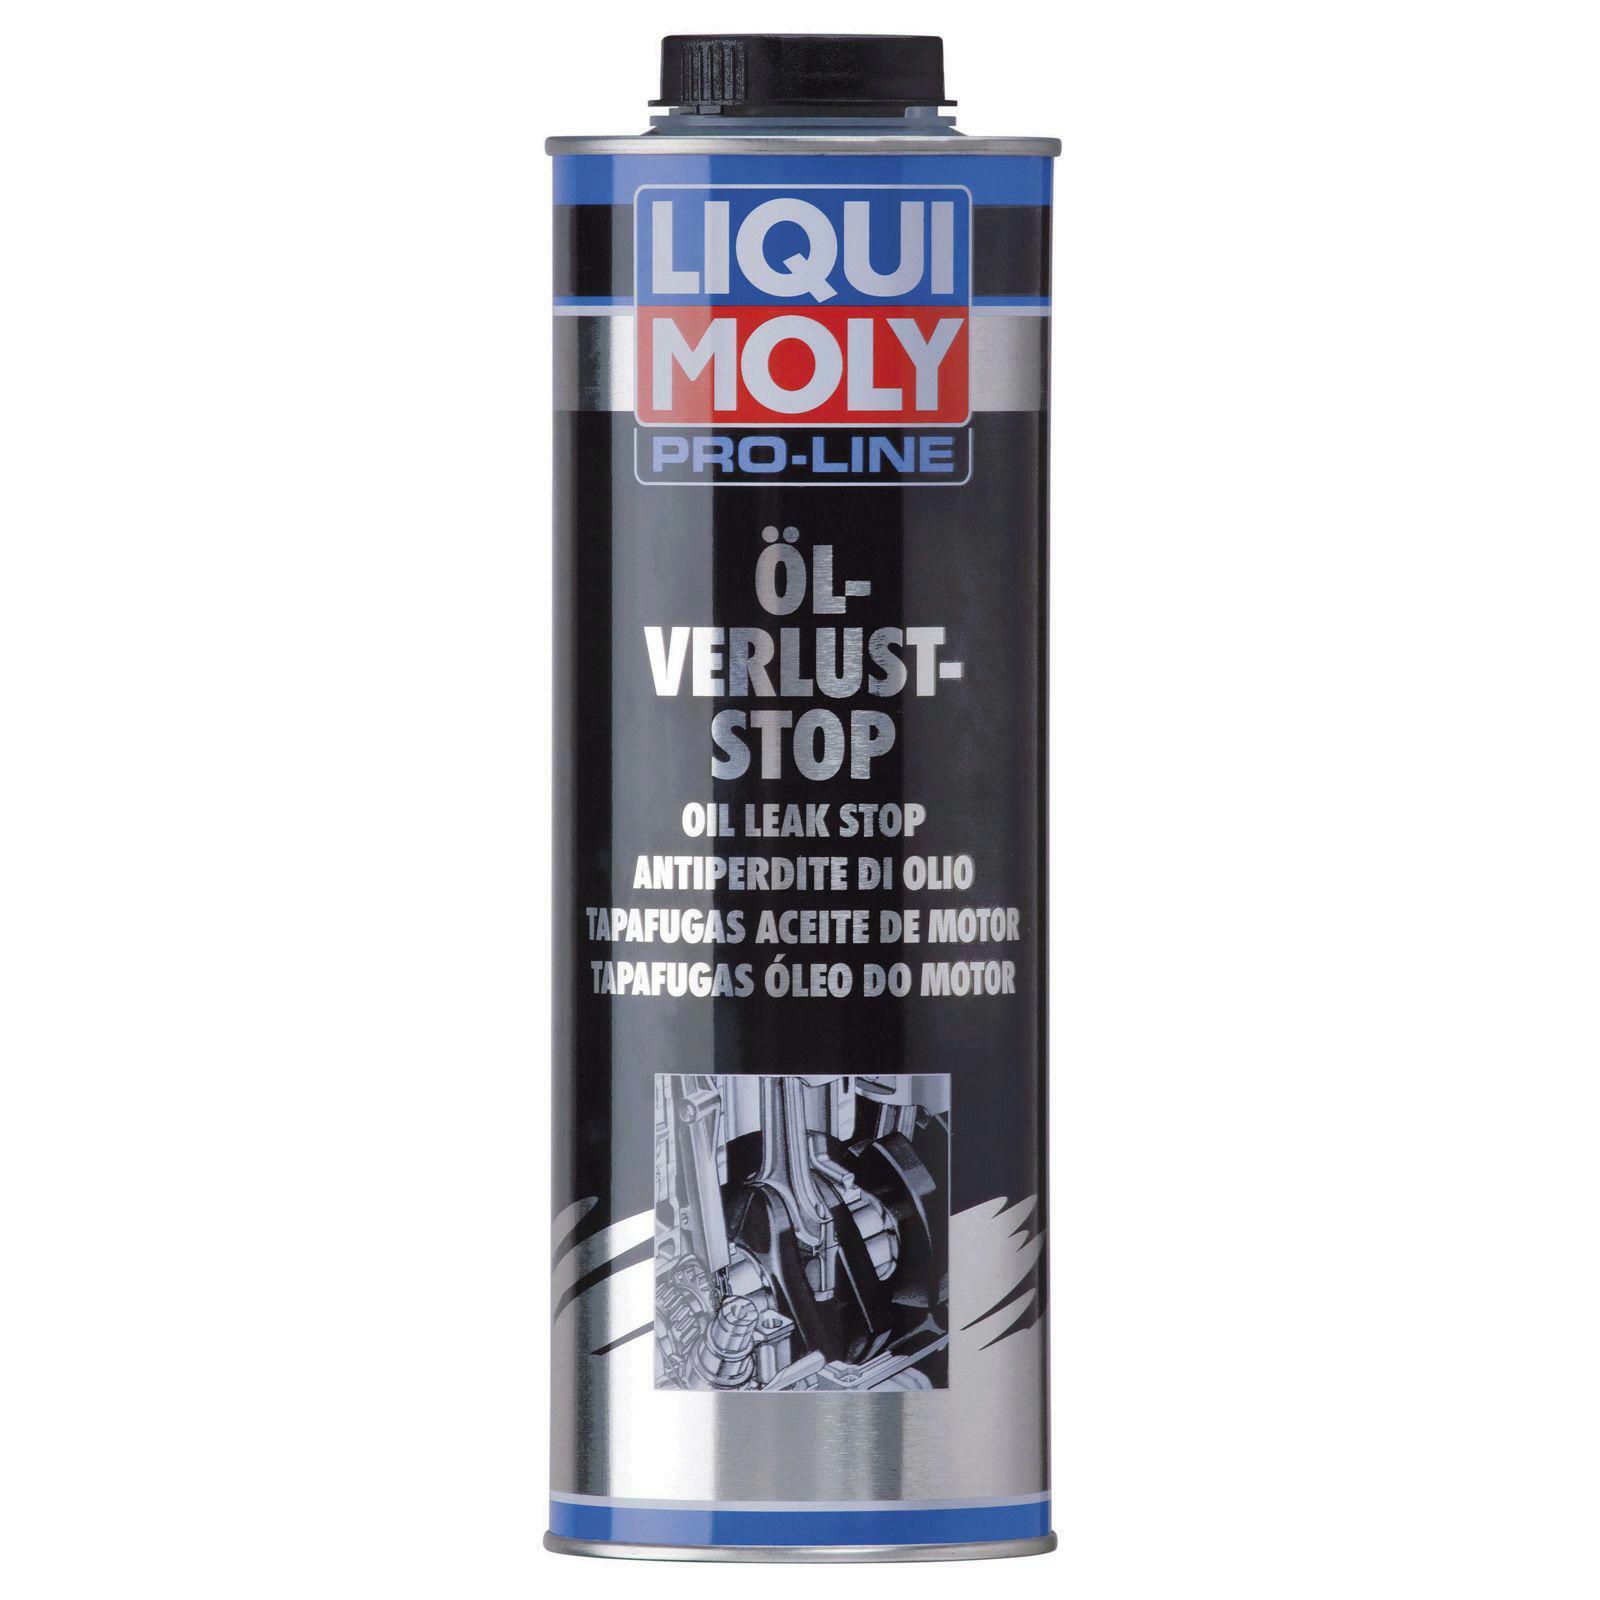 Liqui Moly Pro-Line Öl-Verlust-Stop 1l